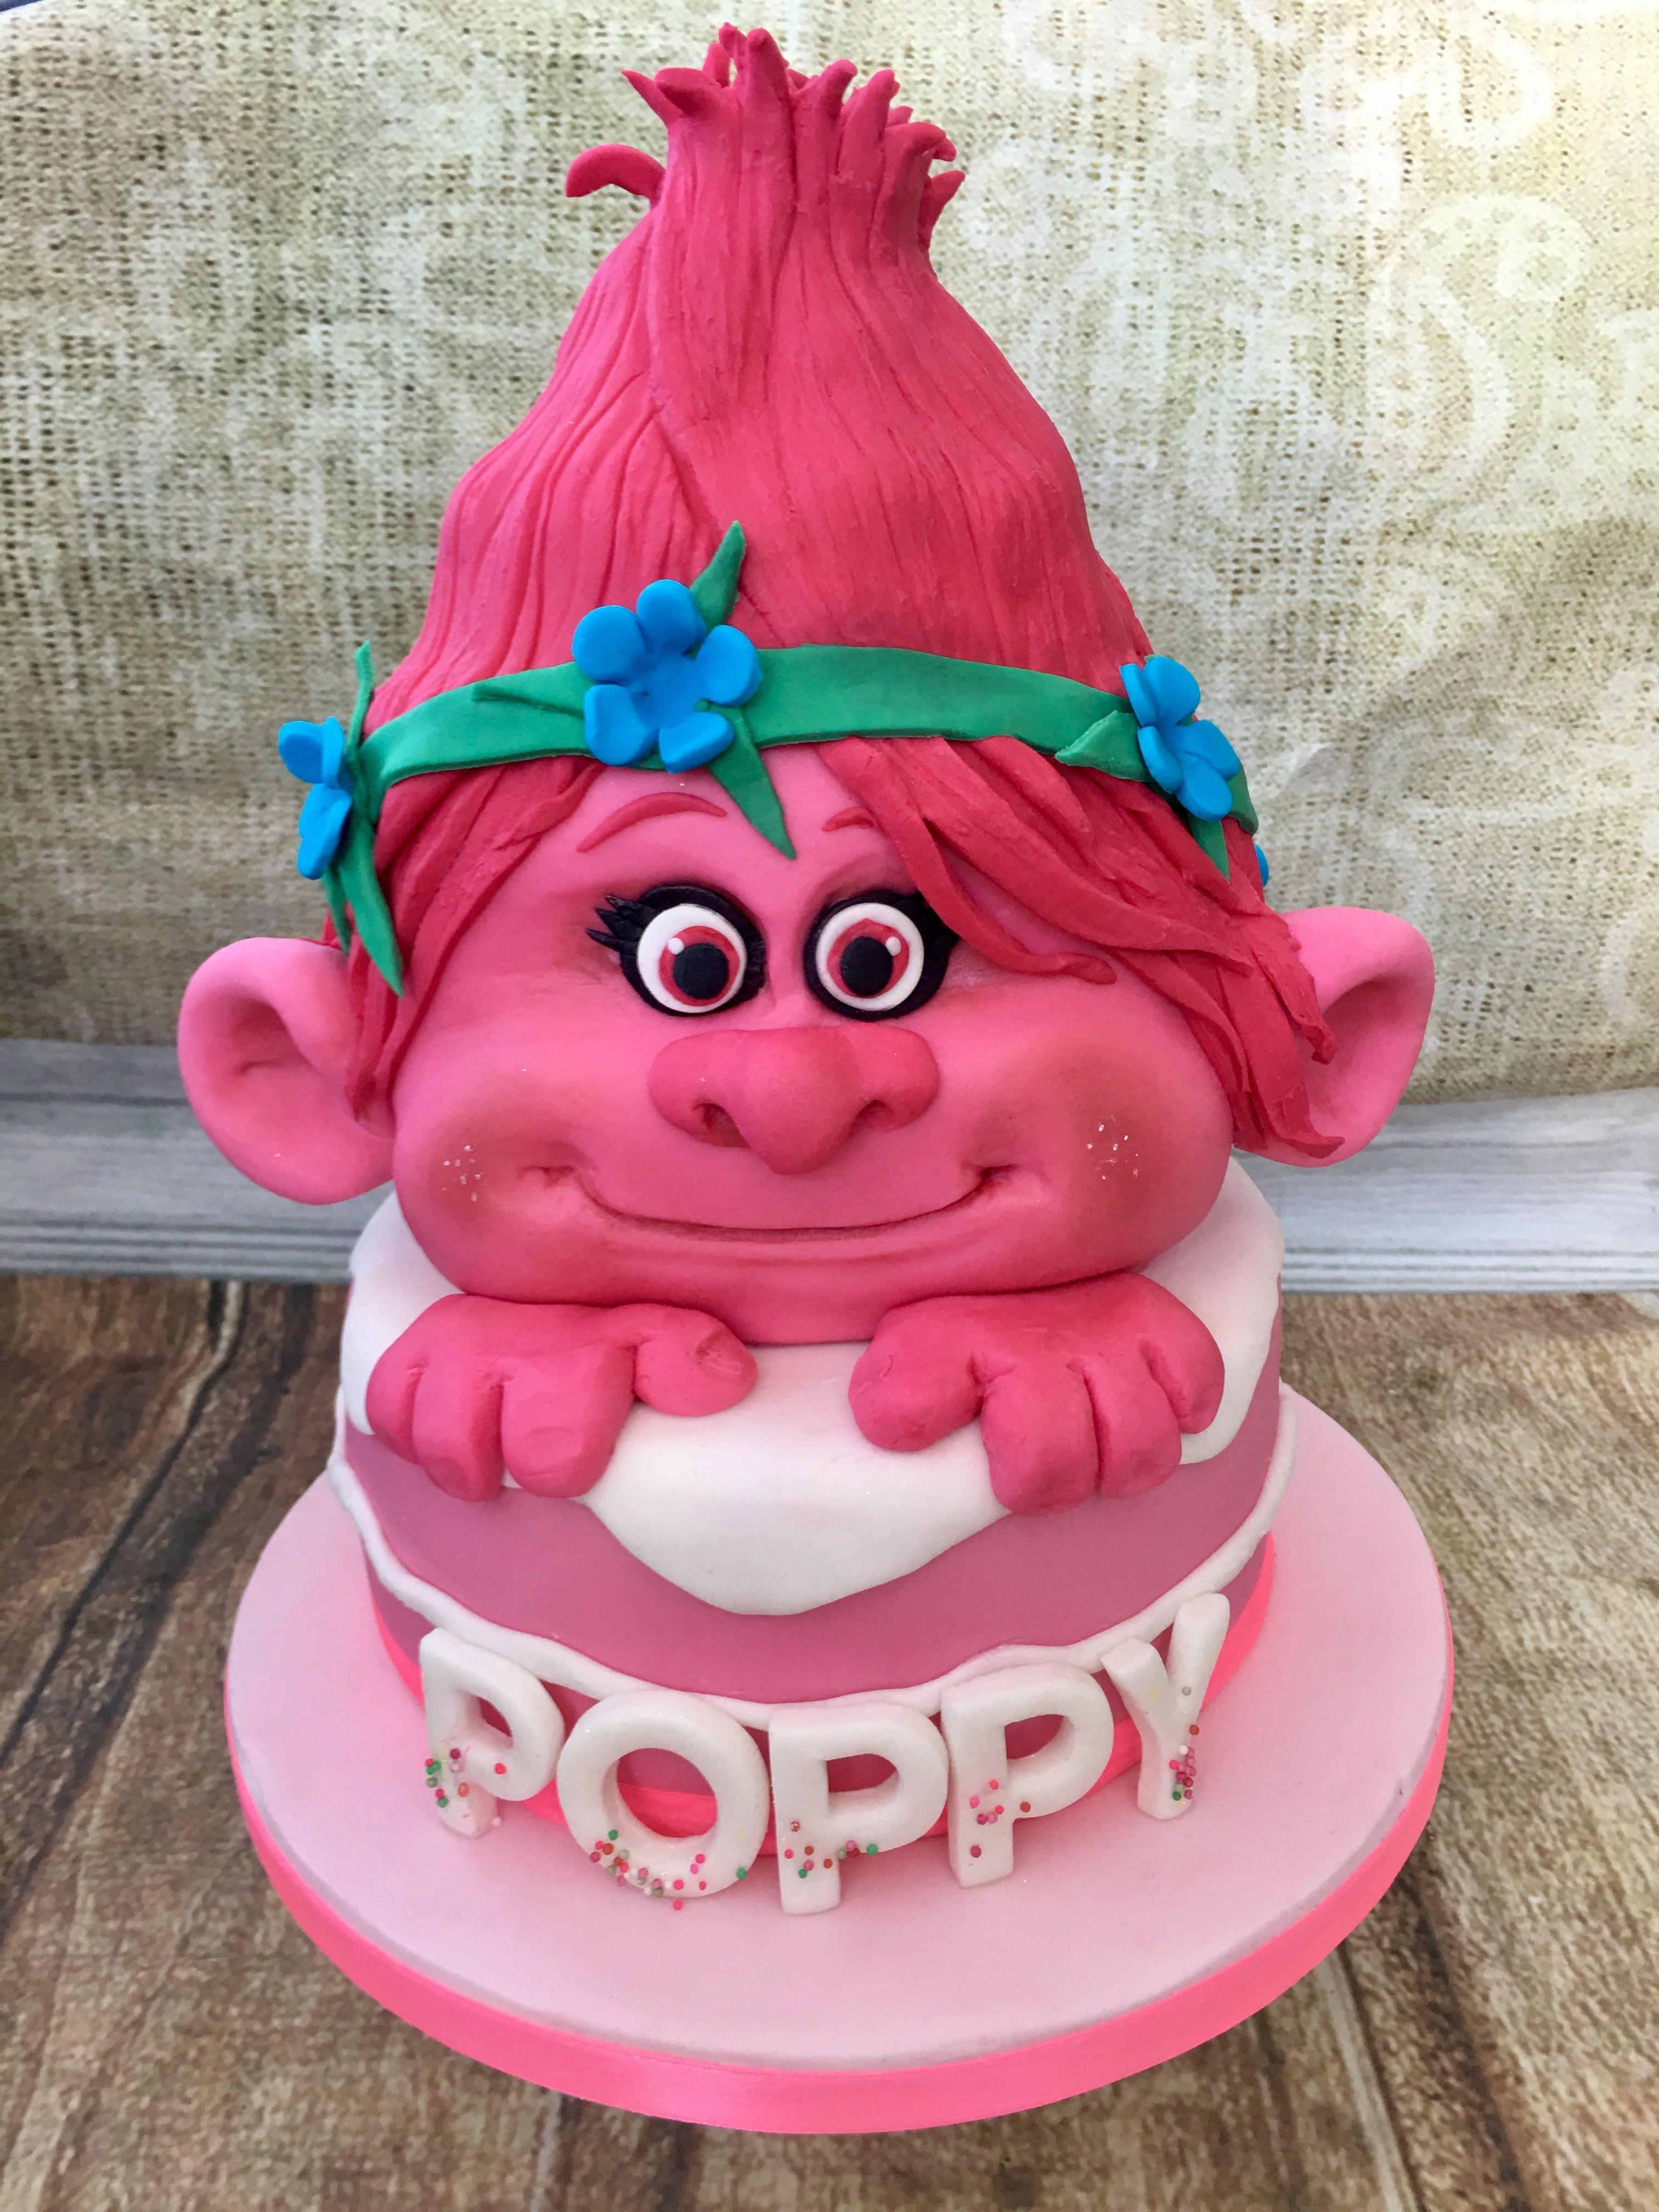 Princess Poppy Troll Birthday Cake By Helen Backhouse